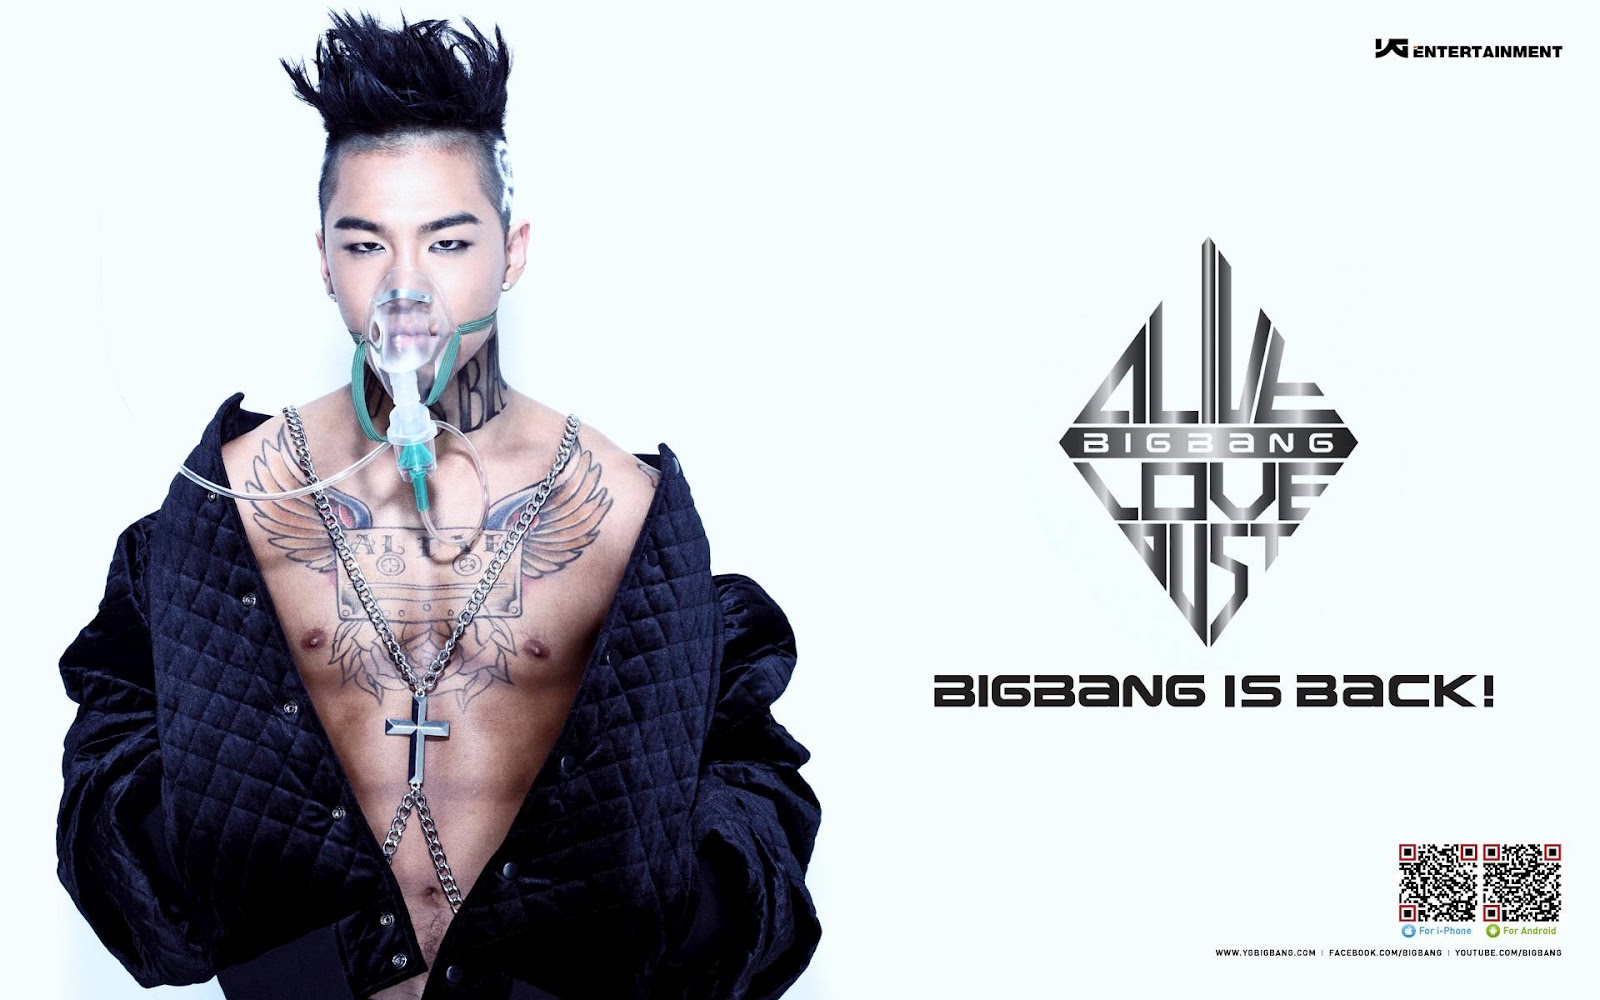 taeyang yg entertainment wallpaper 33753247 fanpop